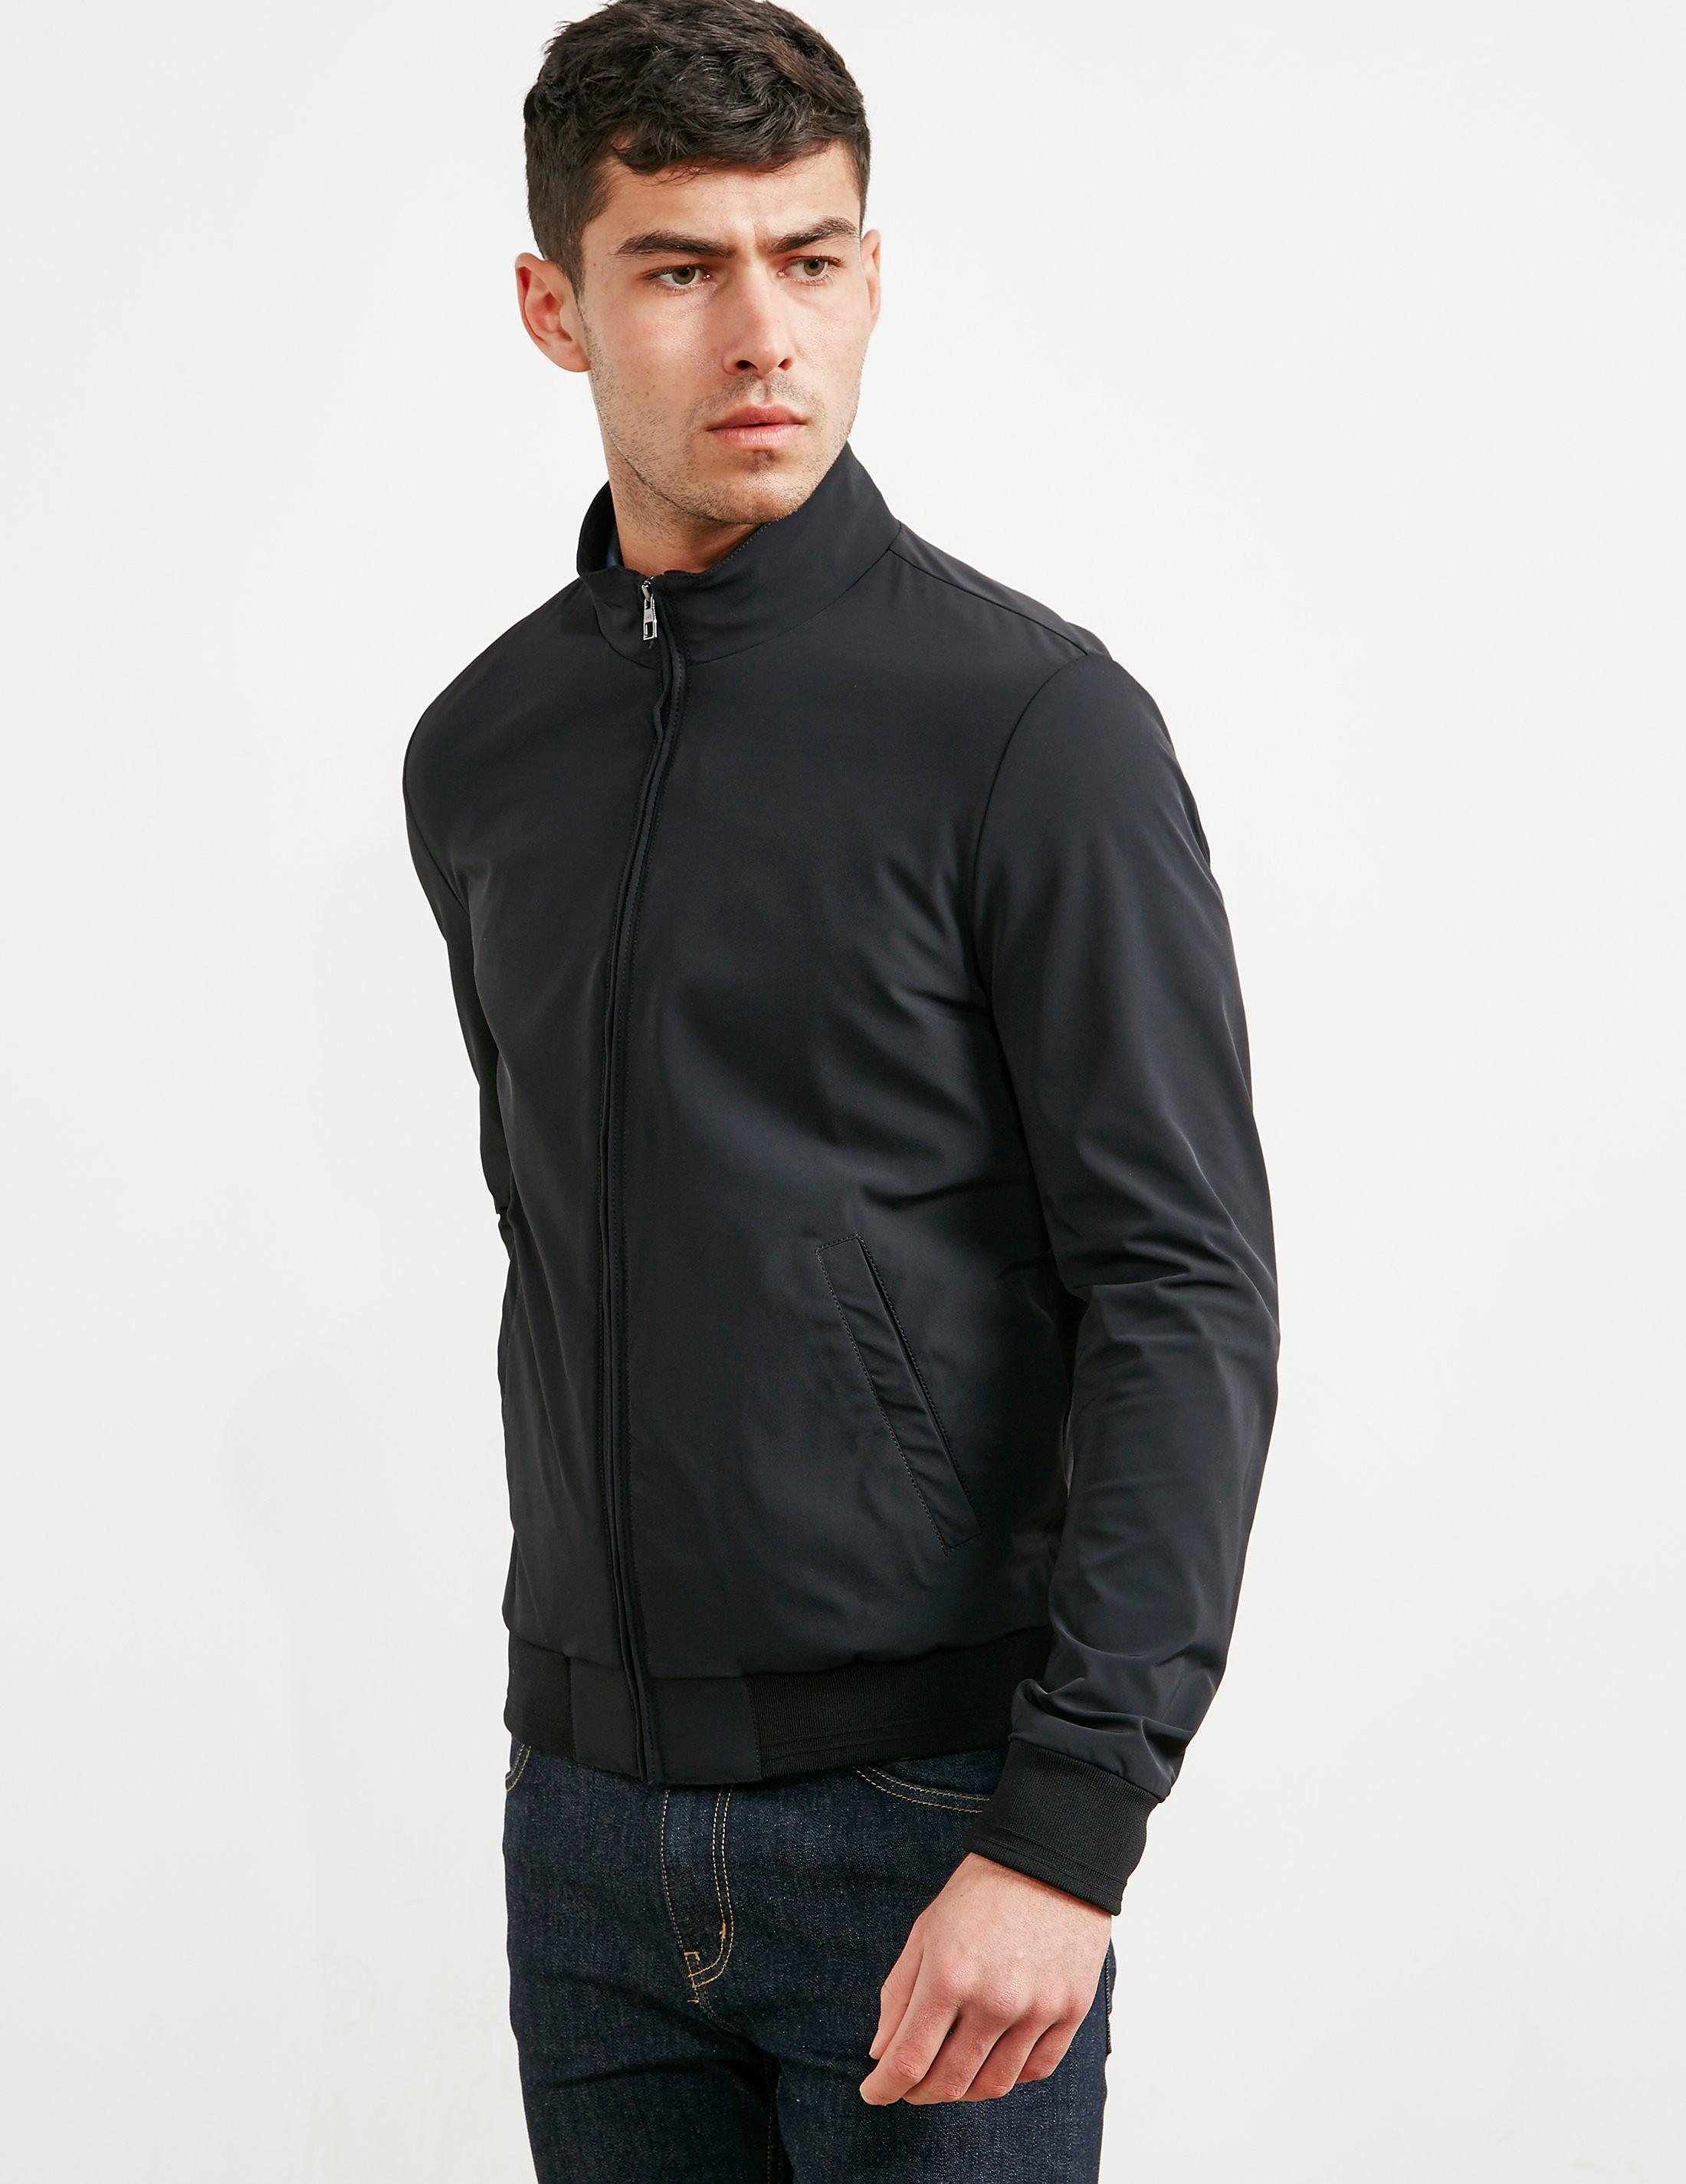 Pal Zileri Softshell Lightweight Jacket - Online Exclusive